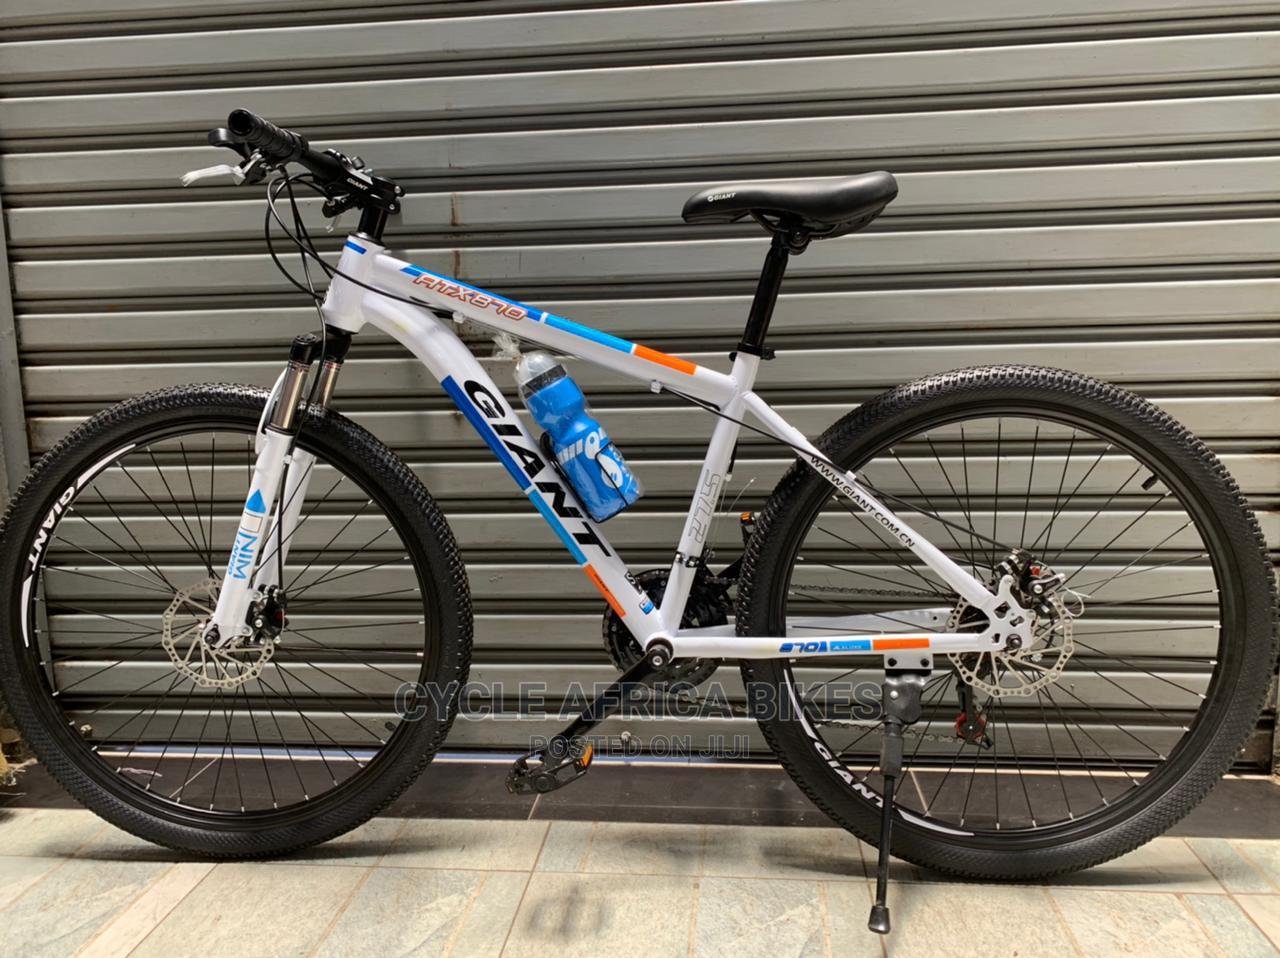 Giant Bicycle Size 27.5